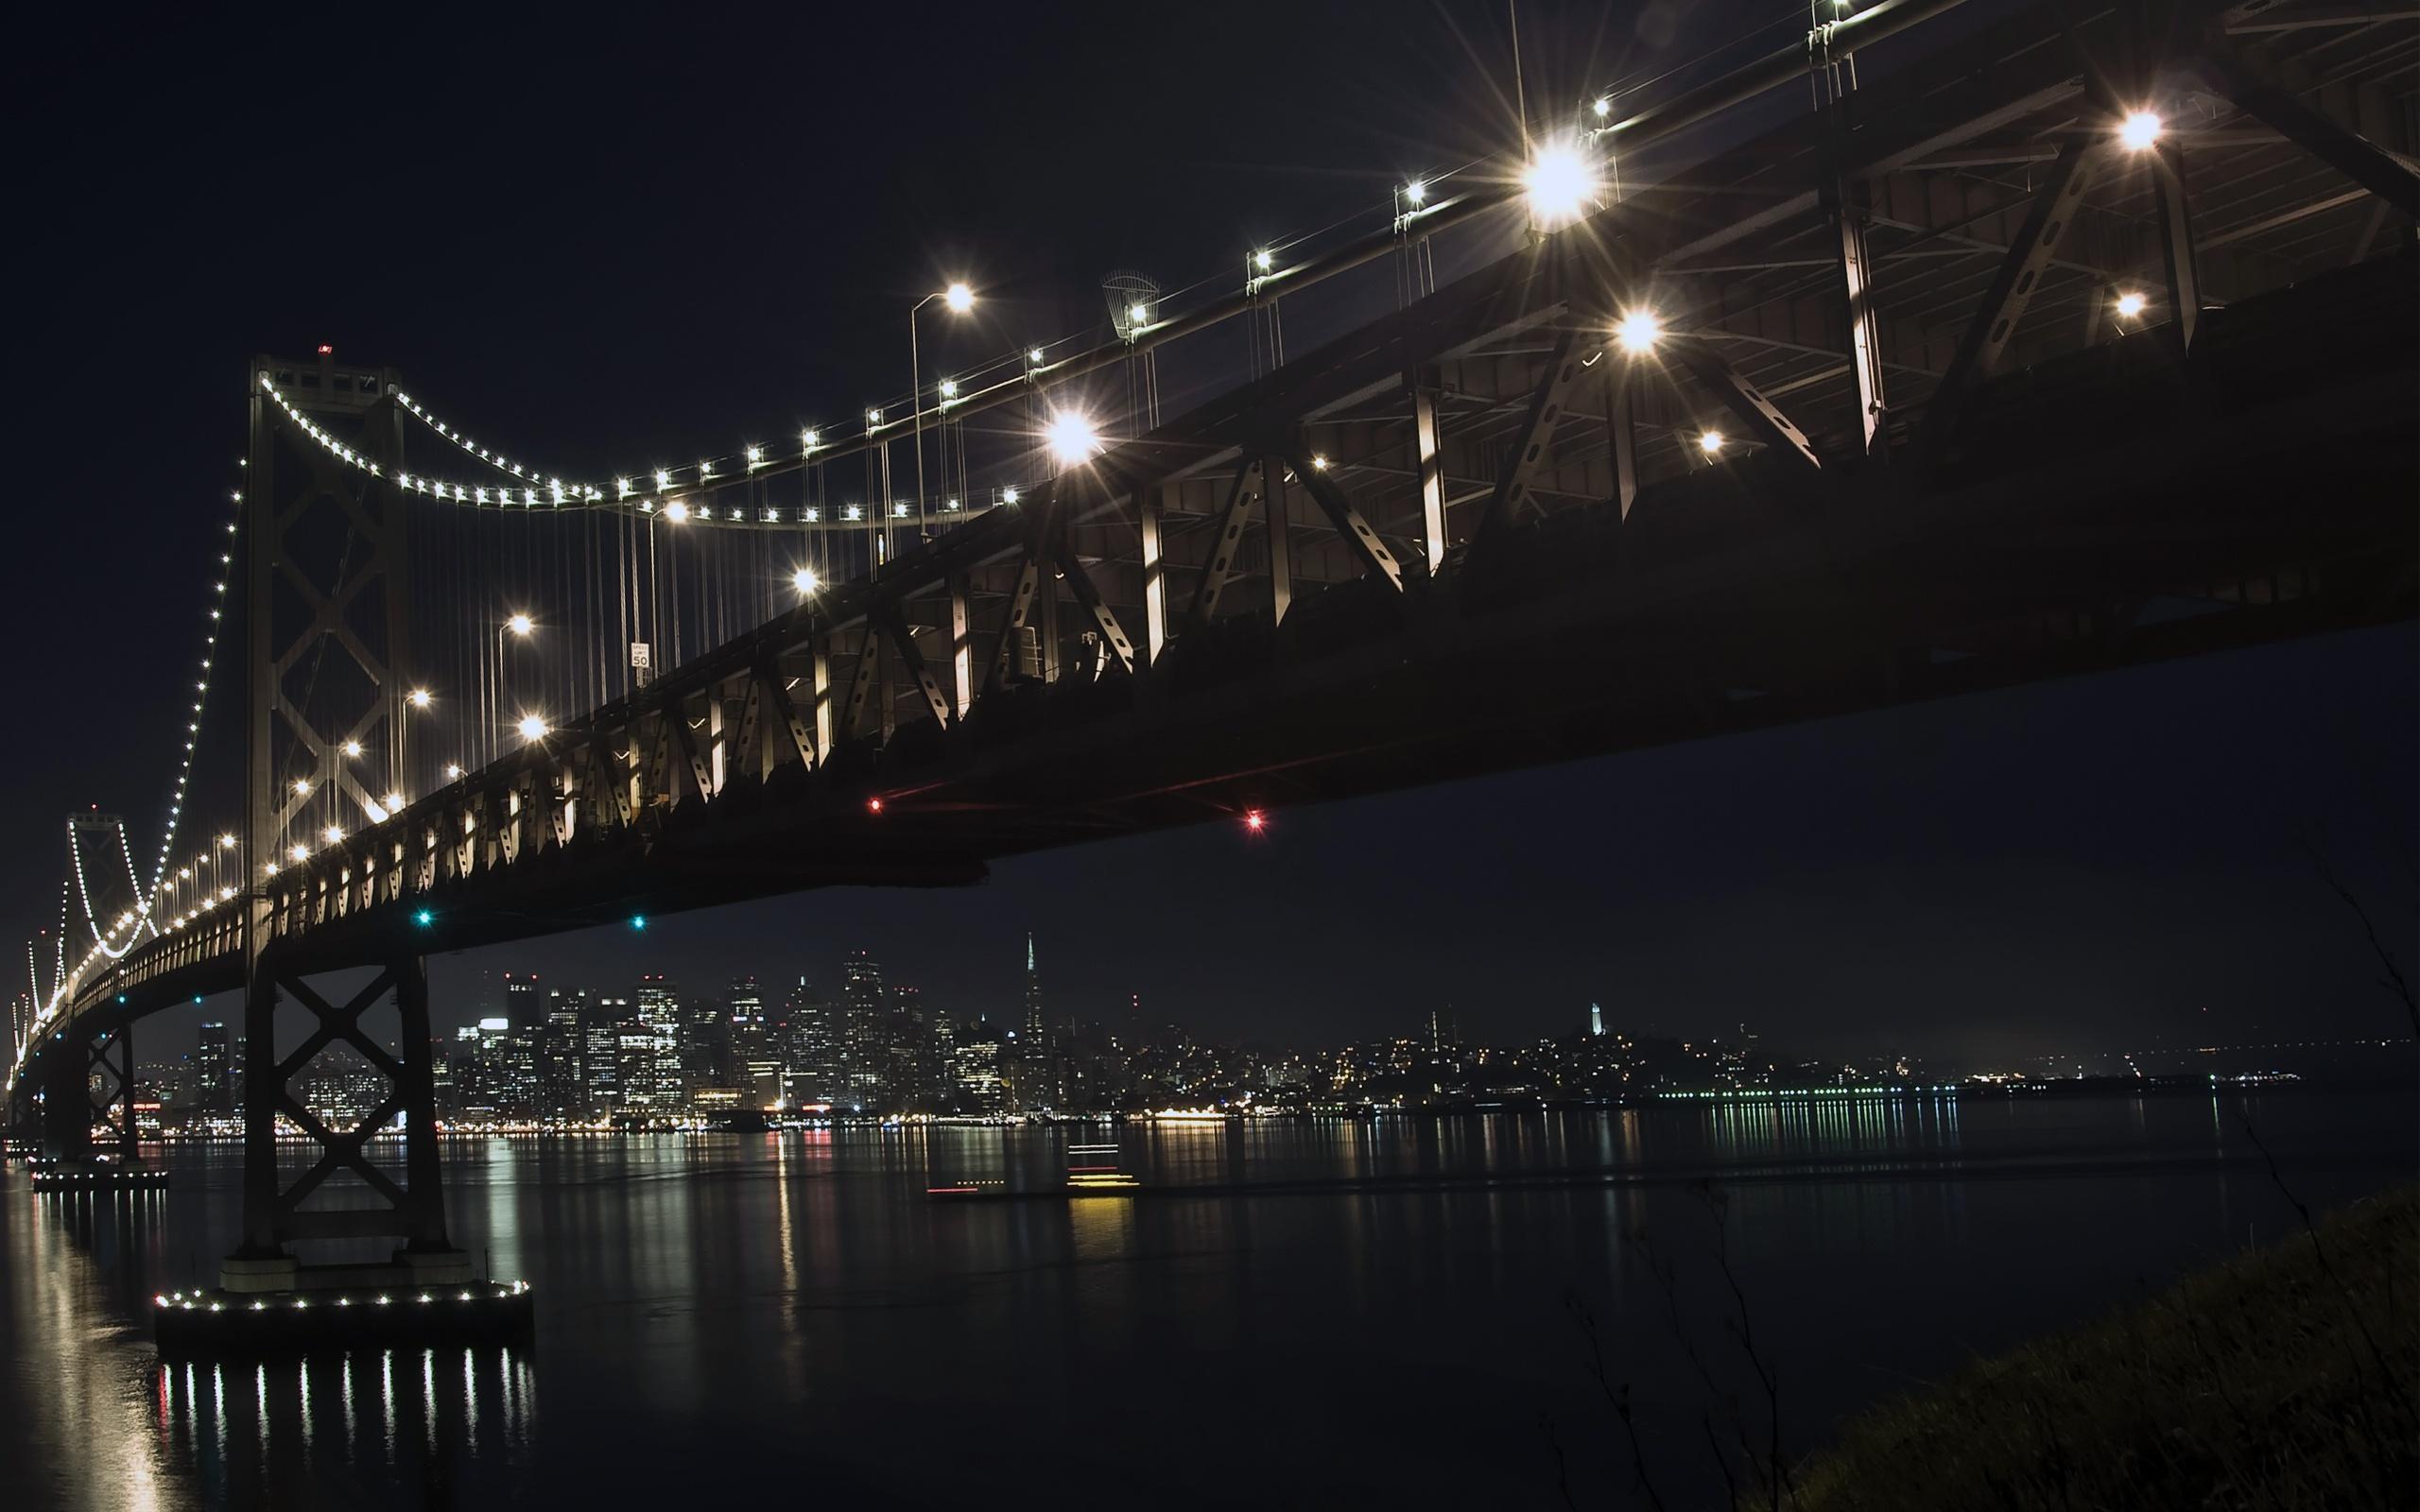 Wallpaper download night - The Bay Bridge By Night